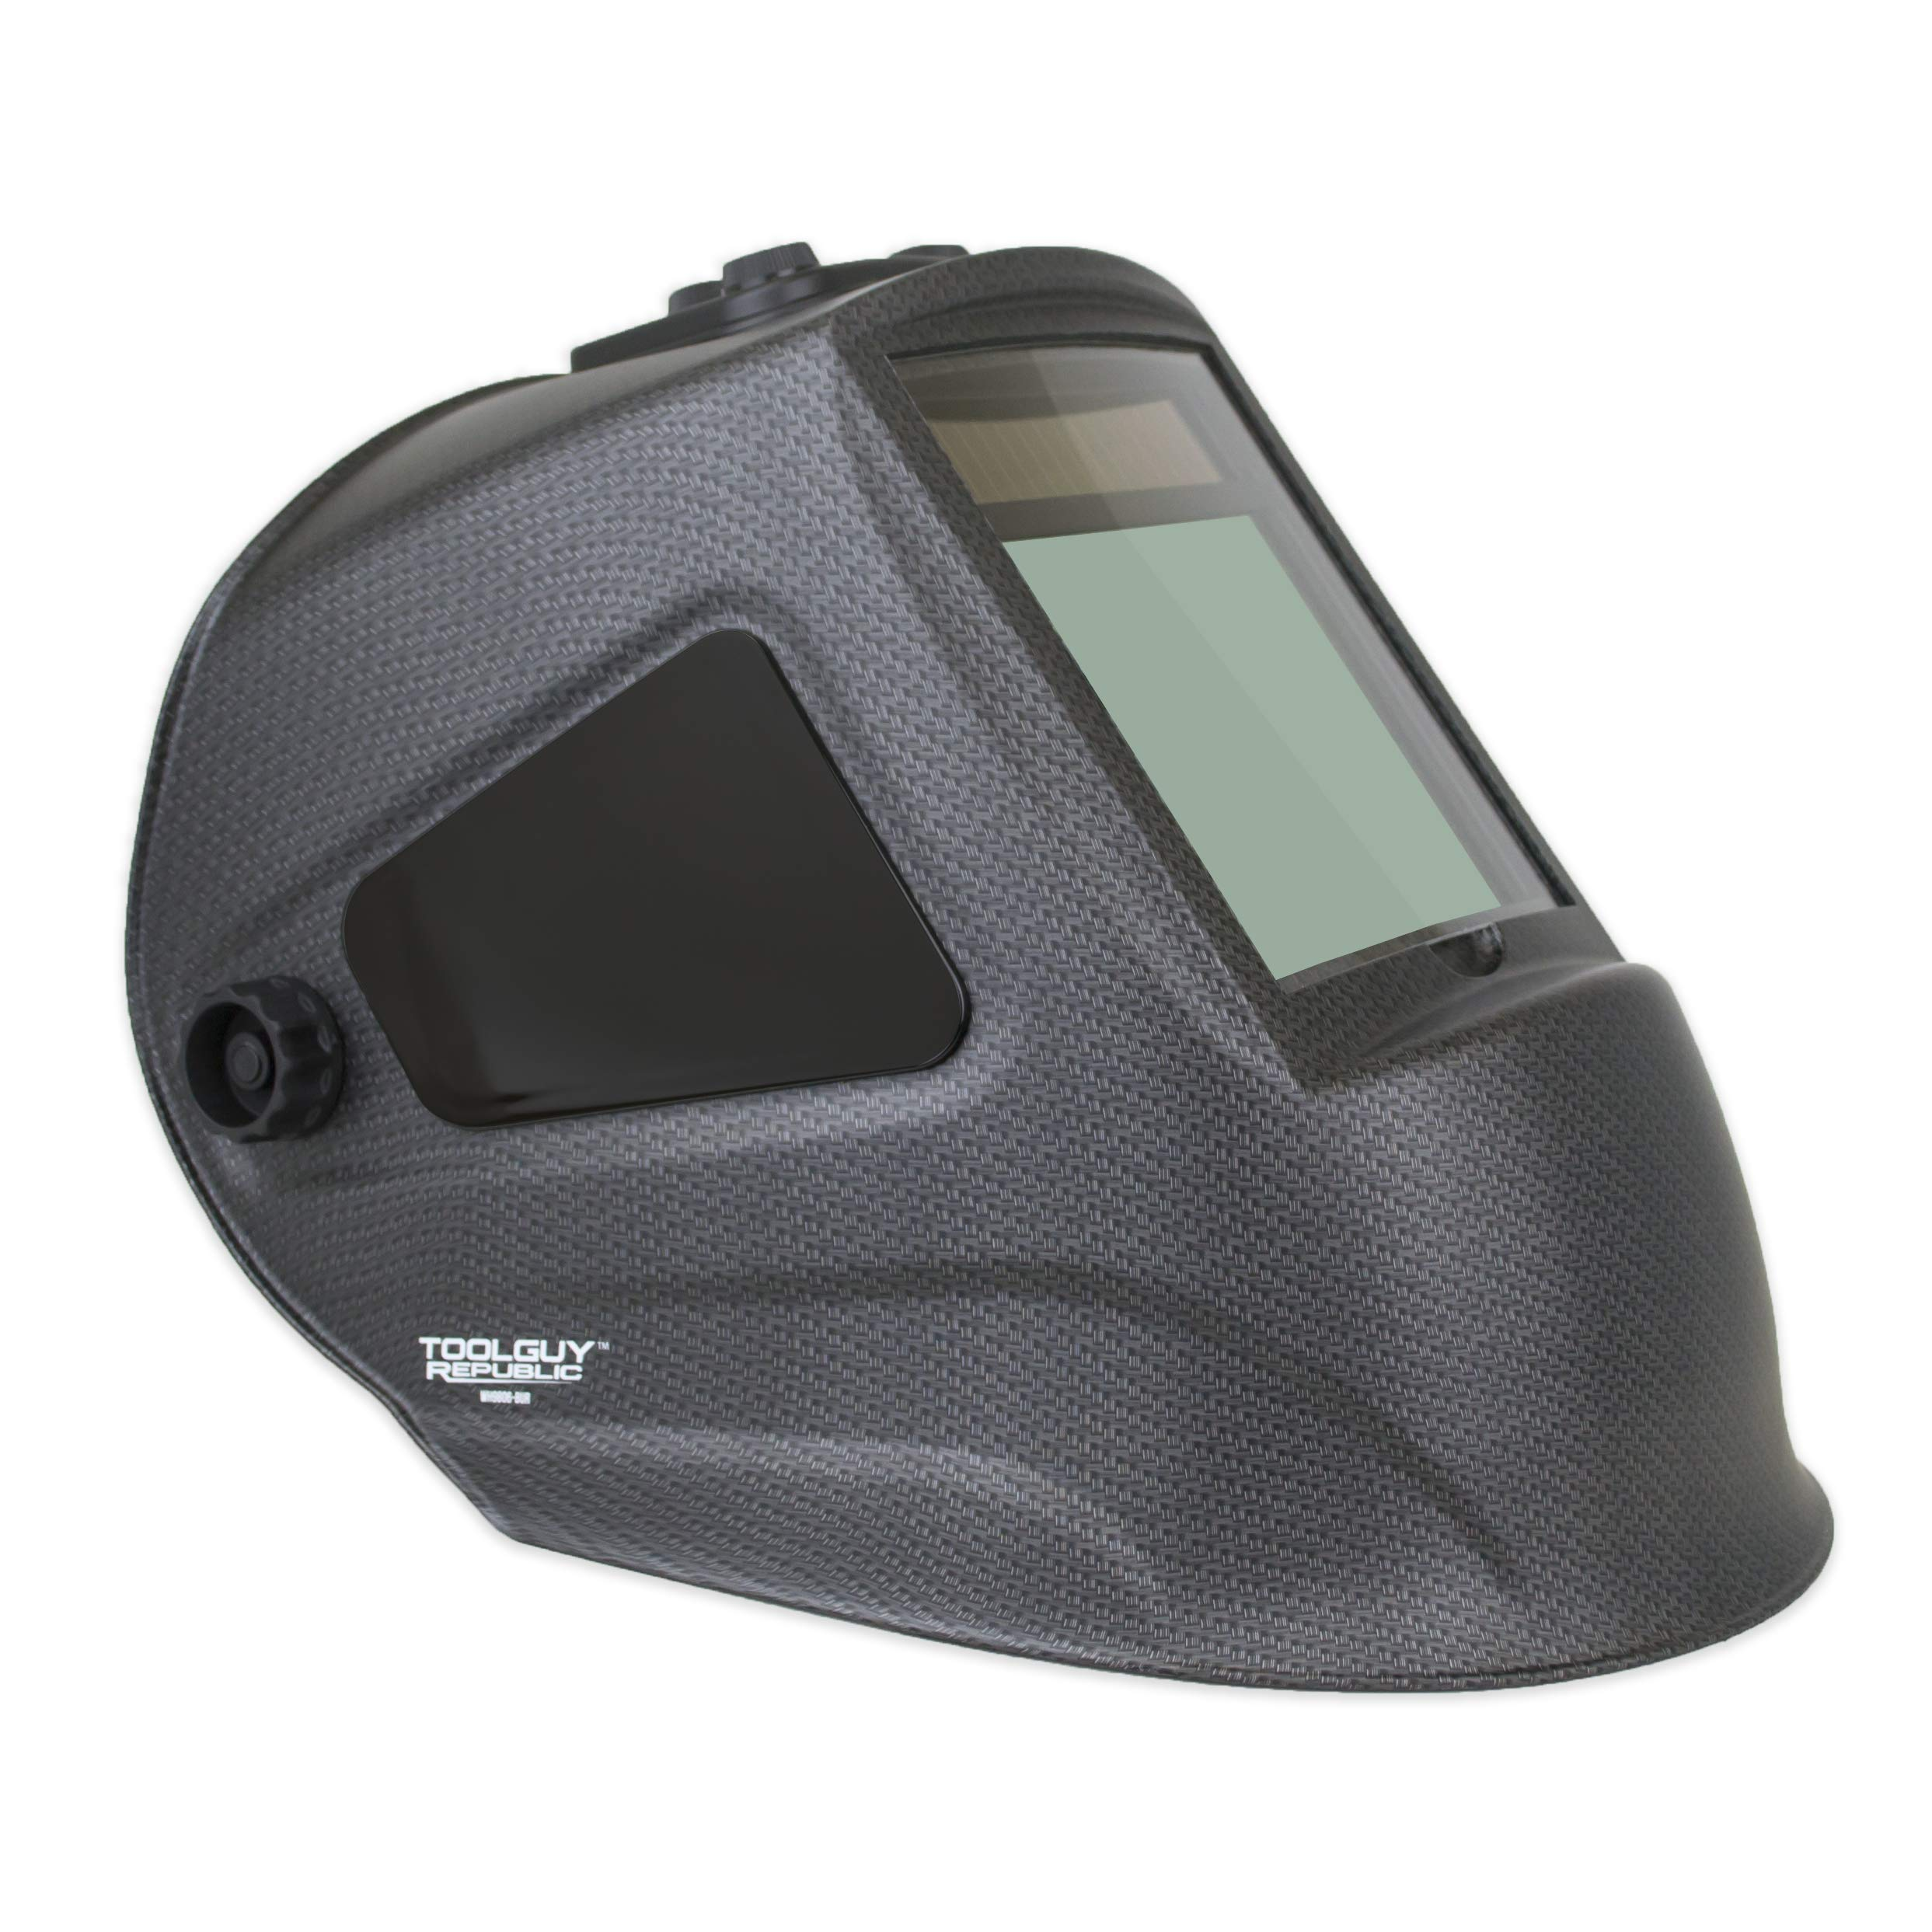 TGR Extra Large View Auto Darkening Welding Helmet 4''W x 3.65''H with SIDE VIEW (Matte Carbon Fiber)